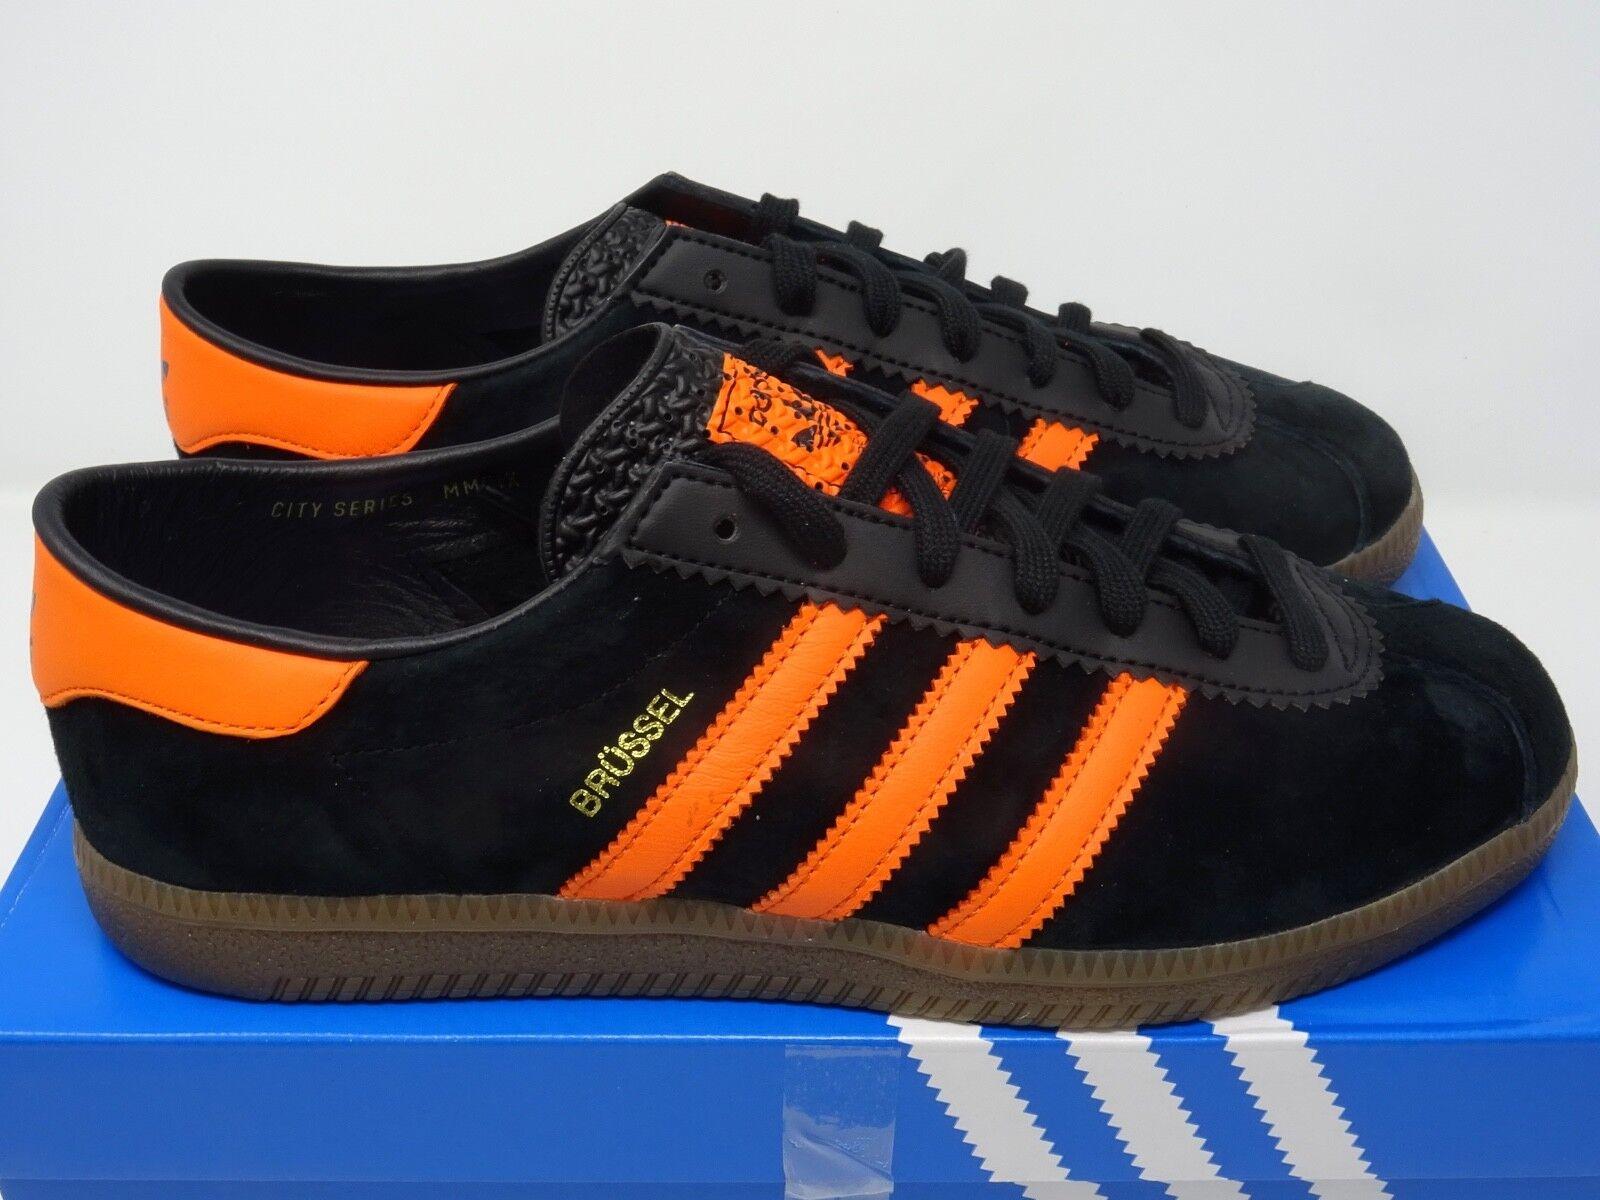 best cheap 1d310 b8ceb Adidas Adidas Adidas Originals Nero Brussels City Series Arancione US 1c0ede